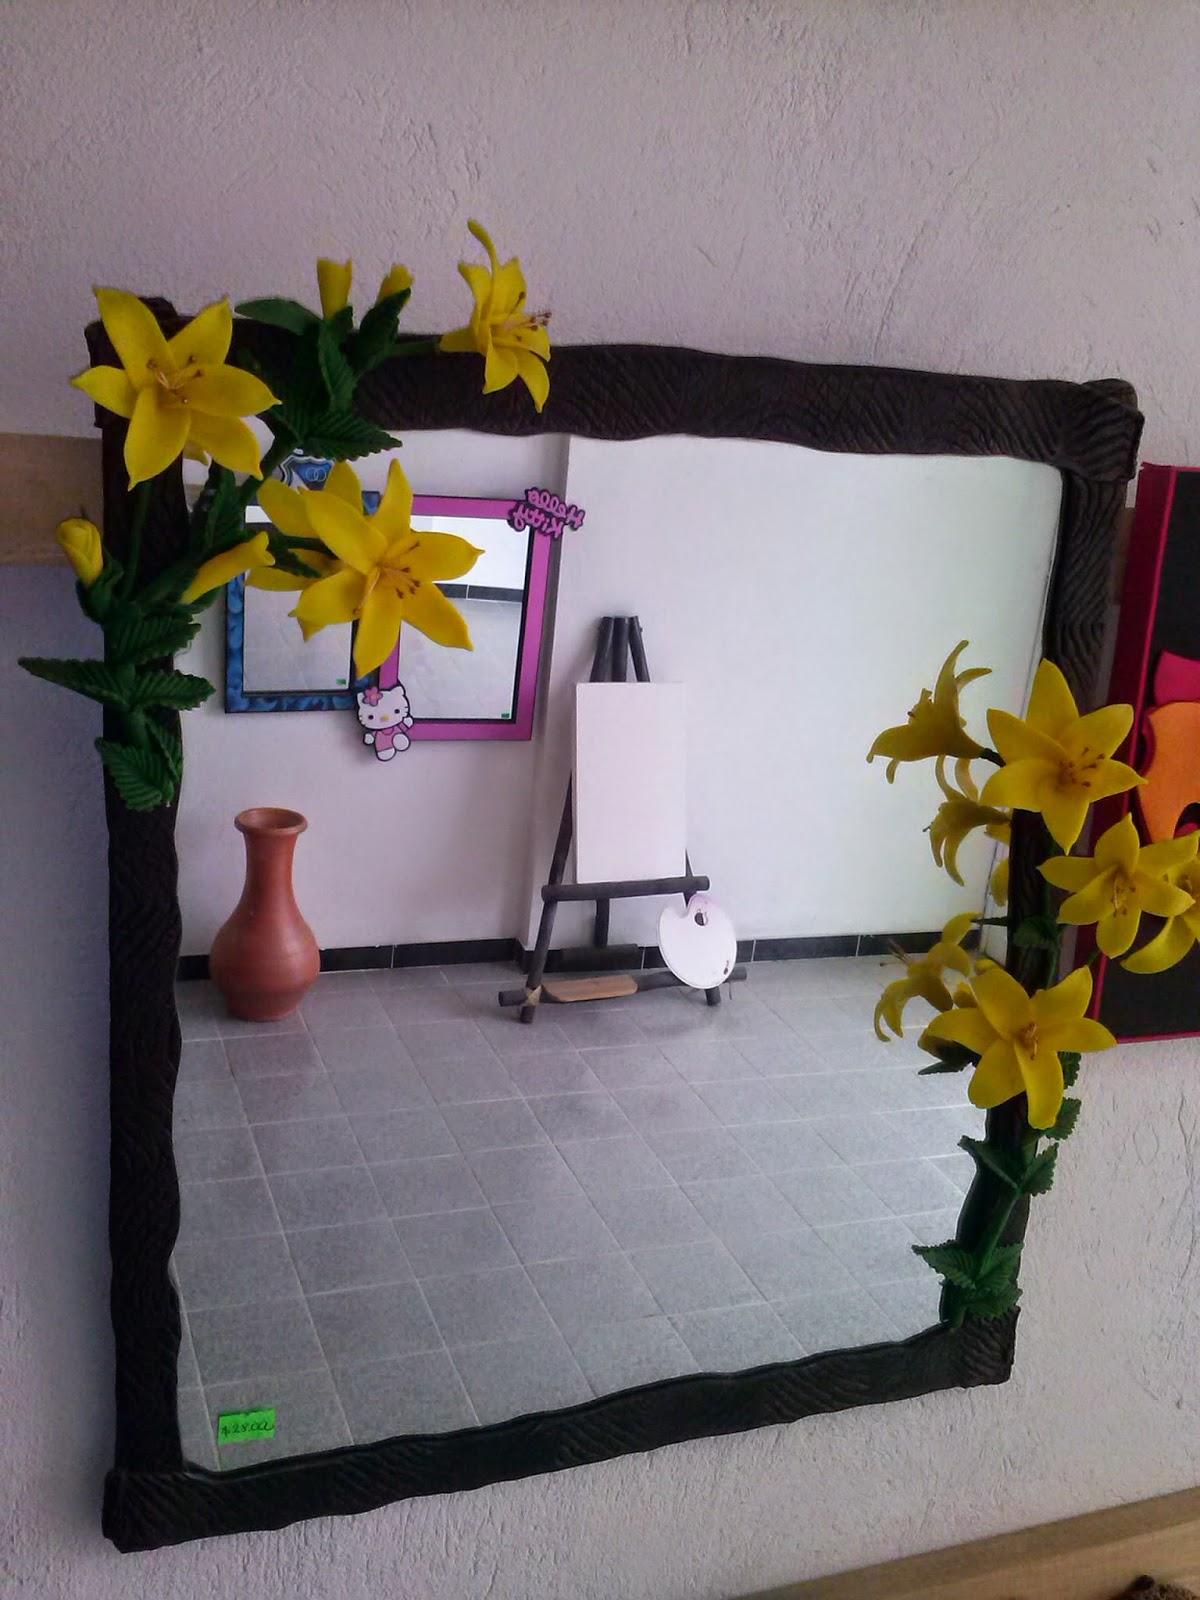 Galeria arte y dise o madekids marcos y espejos for Marcos decorados para espejos